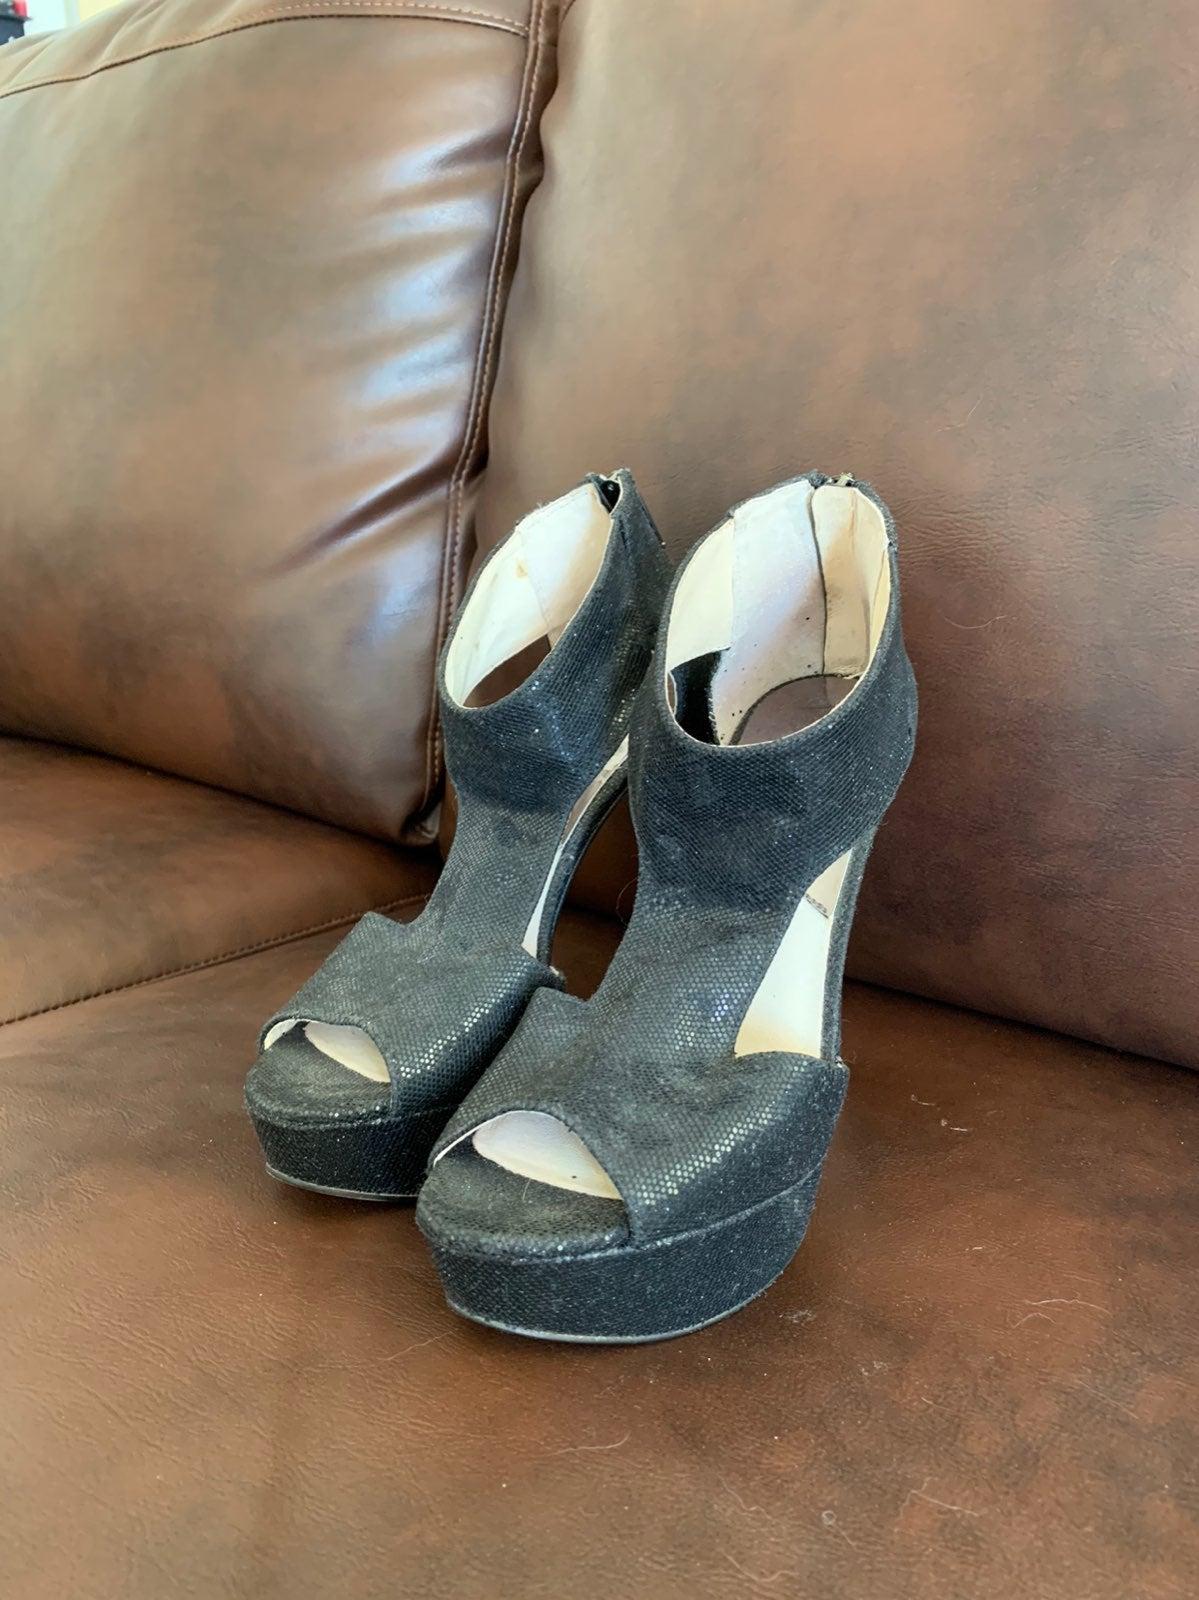 MK high heels